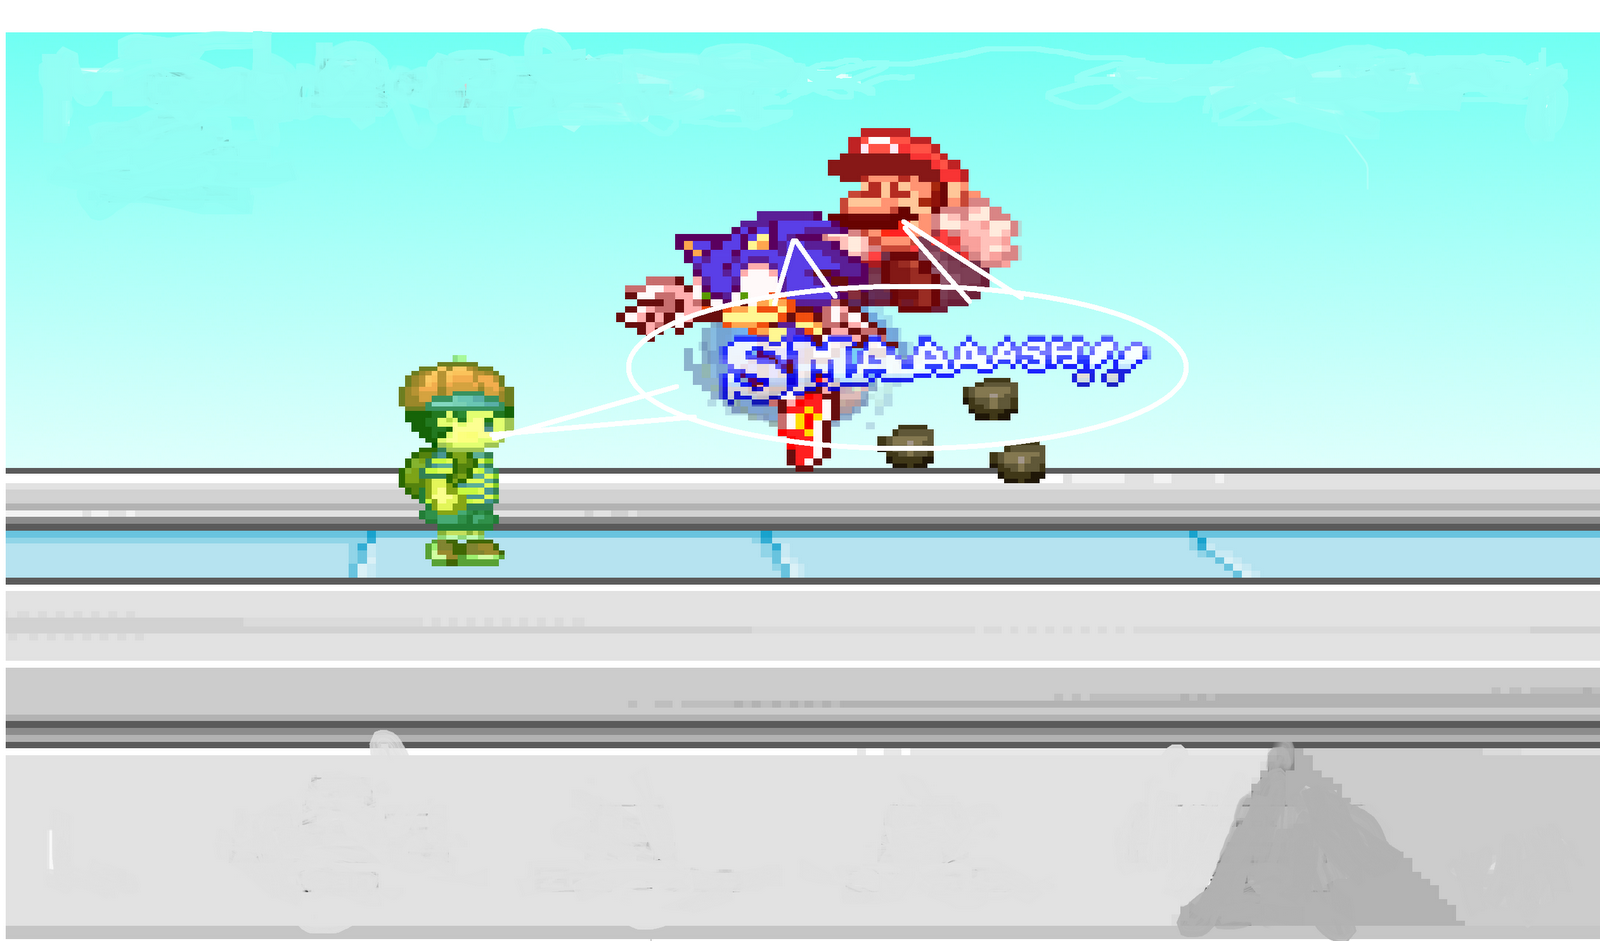 Super smash flash 2 apk kazual game